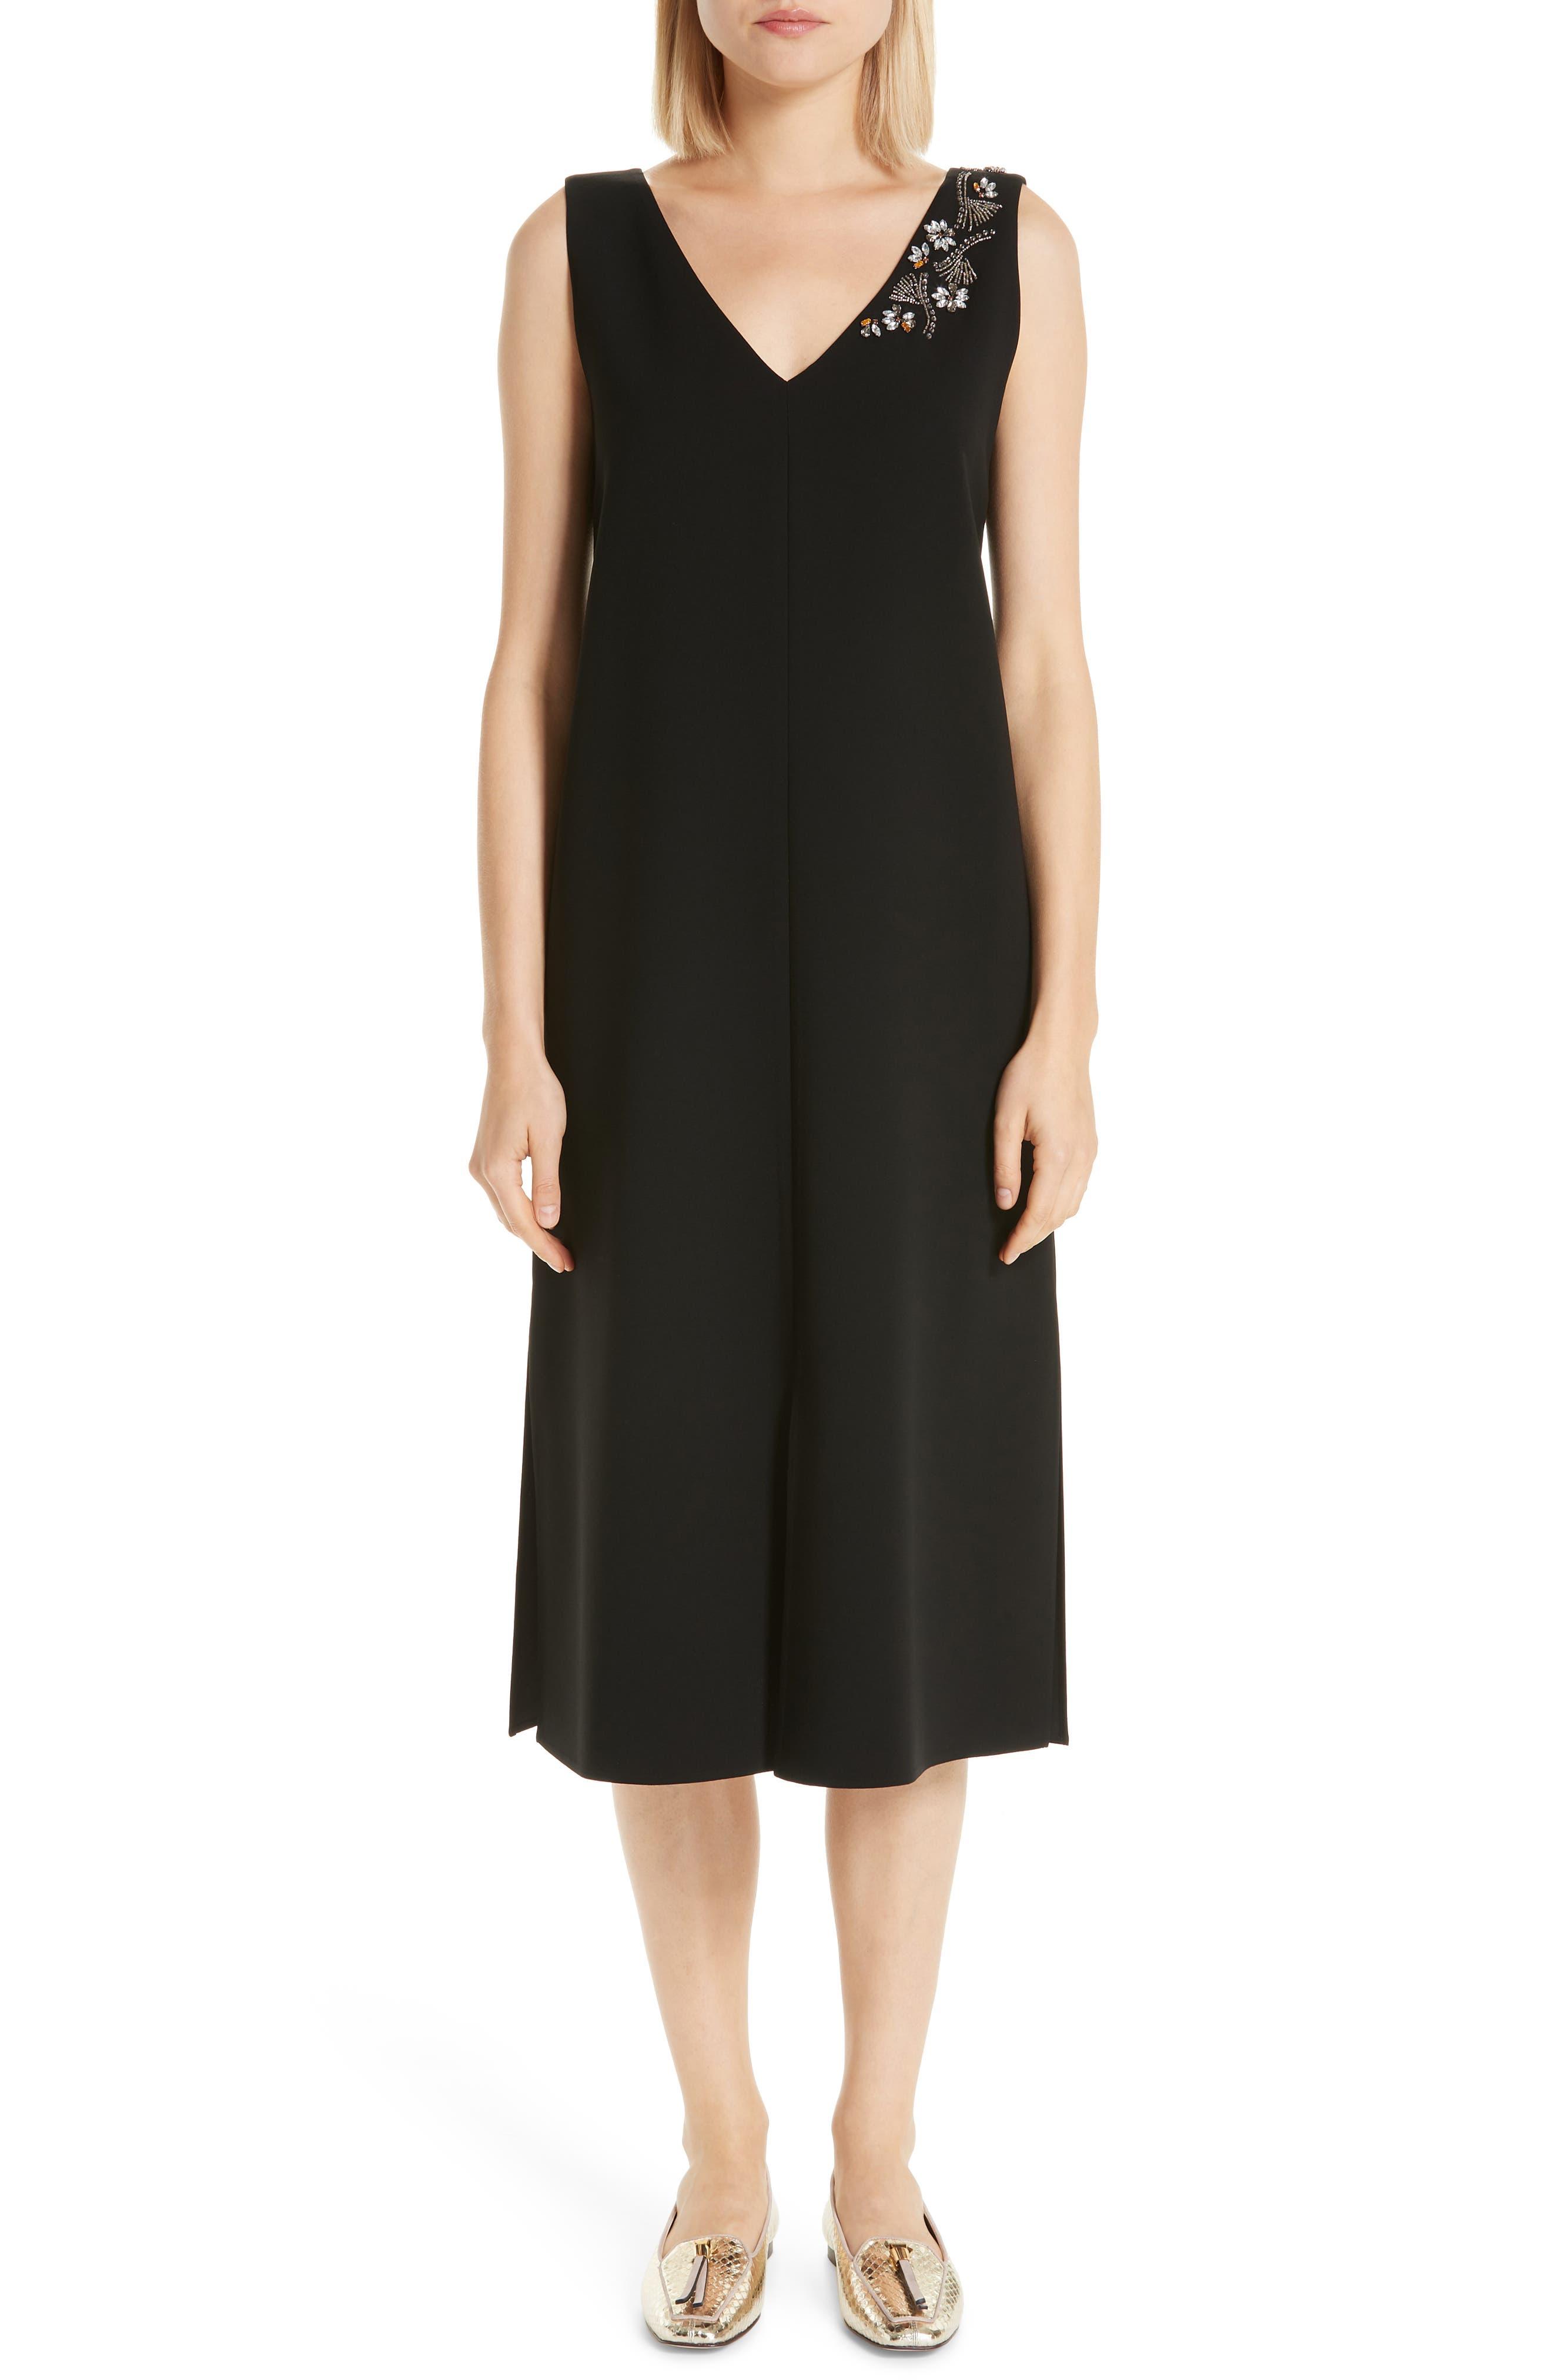 Lafayette 148 New York Dante Embellished Dress, Black